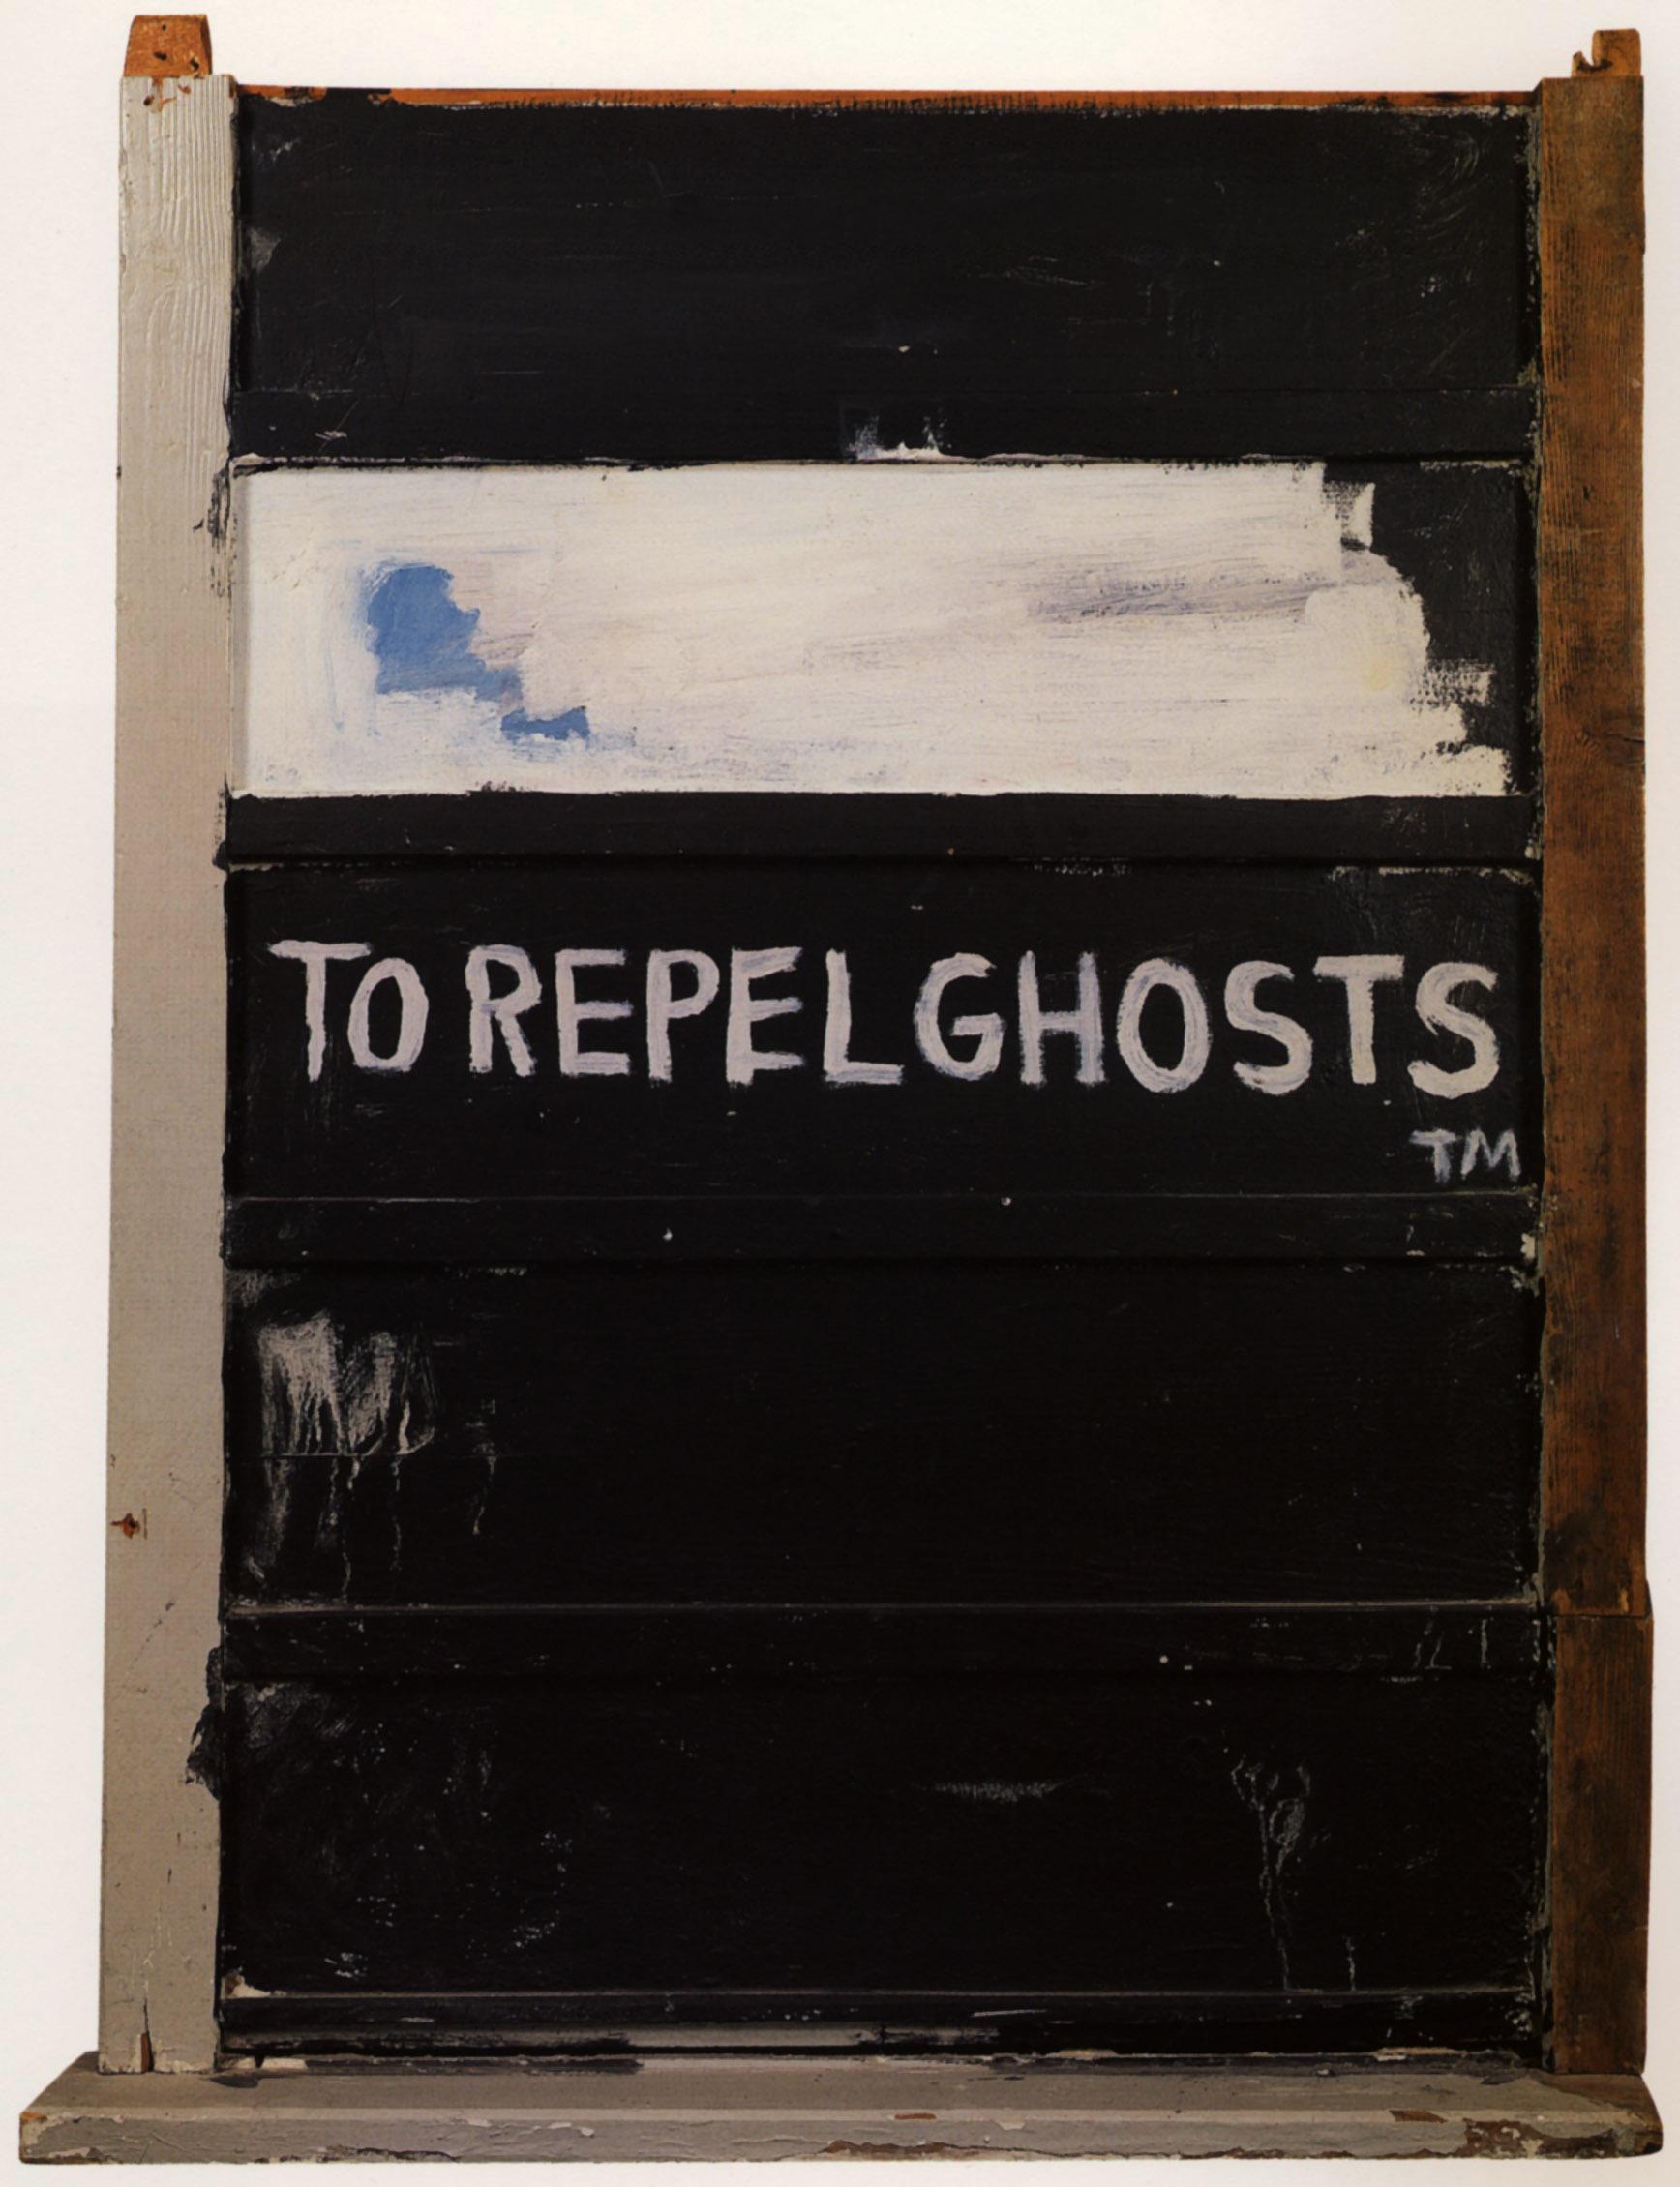 Jean-Michel Basquiat, To Repel Ghosts, 1986